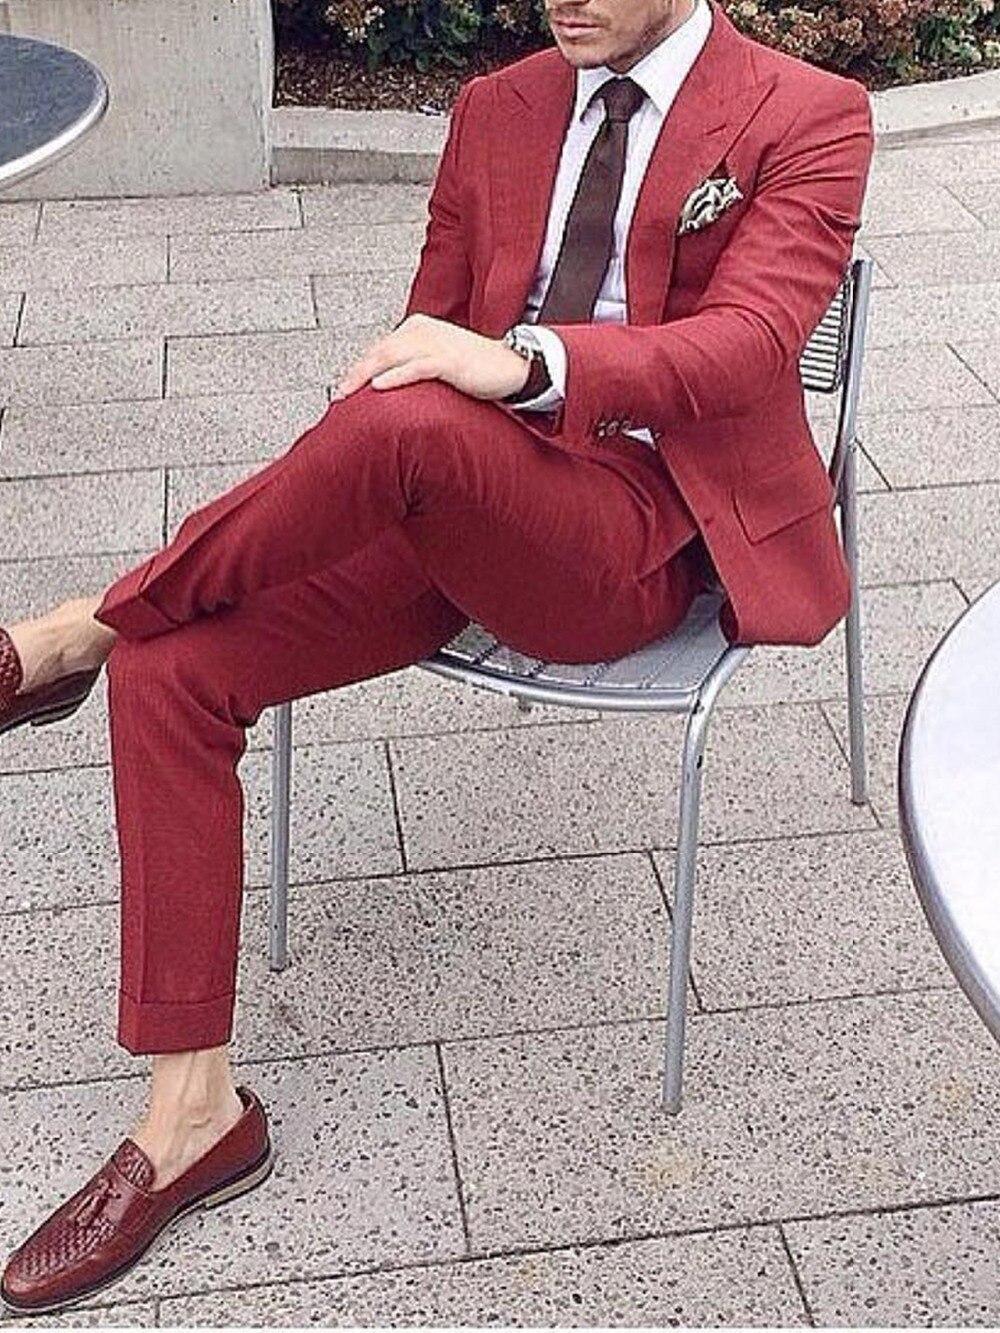 Light Burgundy สมาร์ท Casual Men ชุด 2019 แฟชั่นการออกแบบที่กำหนดเอง Made Slim Fit สีแดงเข้มชุดเสื้อชุดกางเกงงานแต่งงานชุด-ใน สูท จาก เสื้อผ้าผู้ชาย บน   1